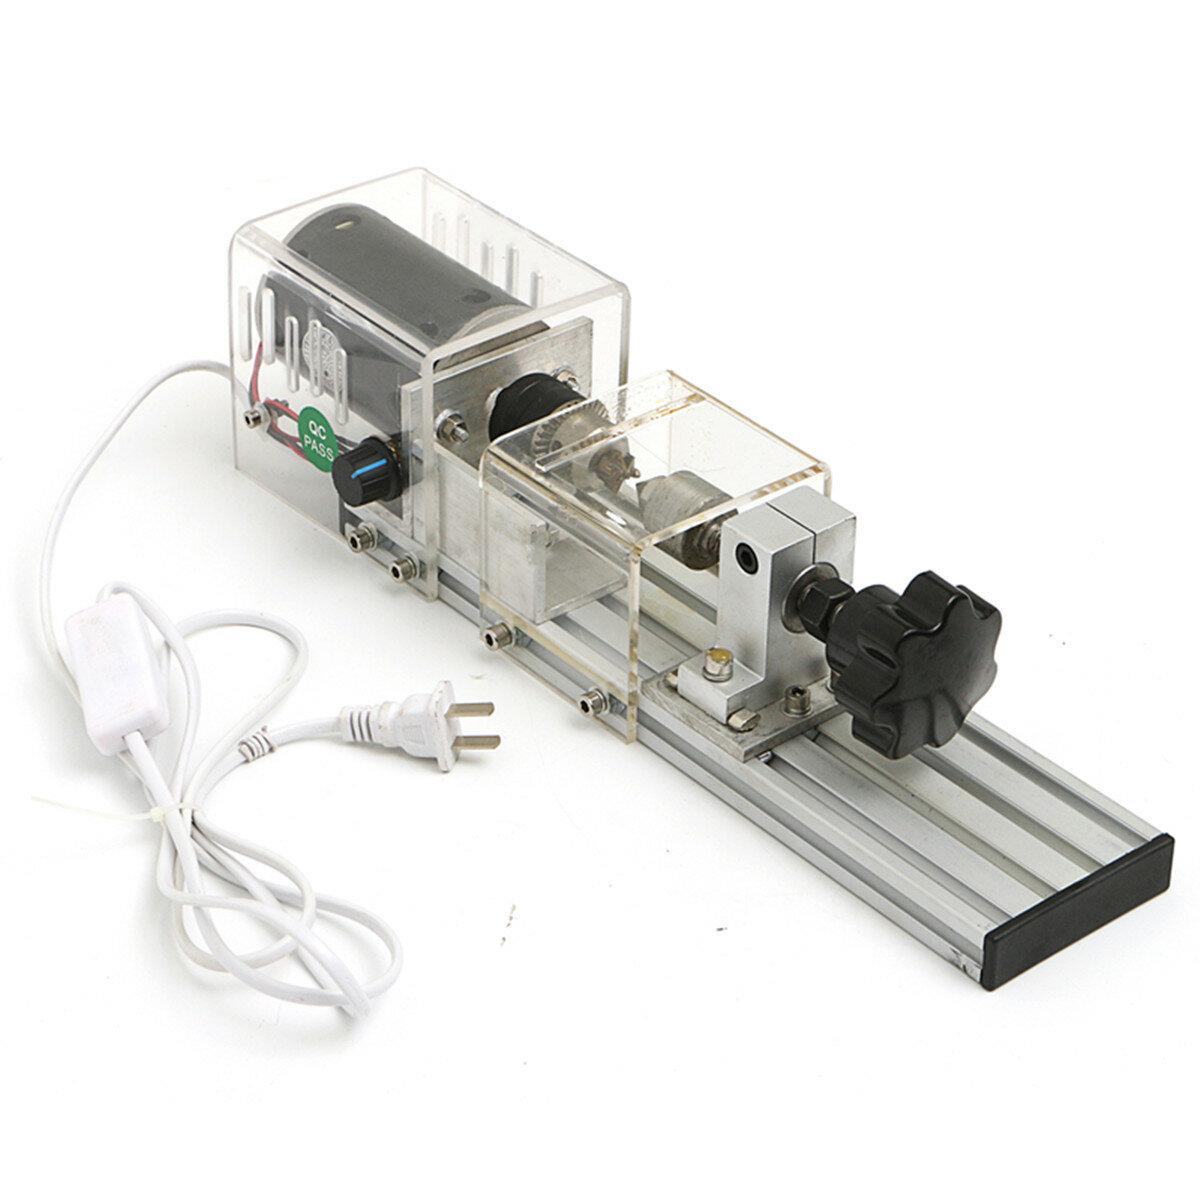 Raitool 350W Mini Lathe Machine Woodworking DIY Lathe Set with Power Adapter